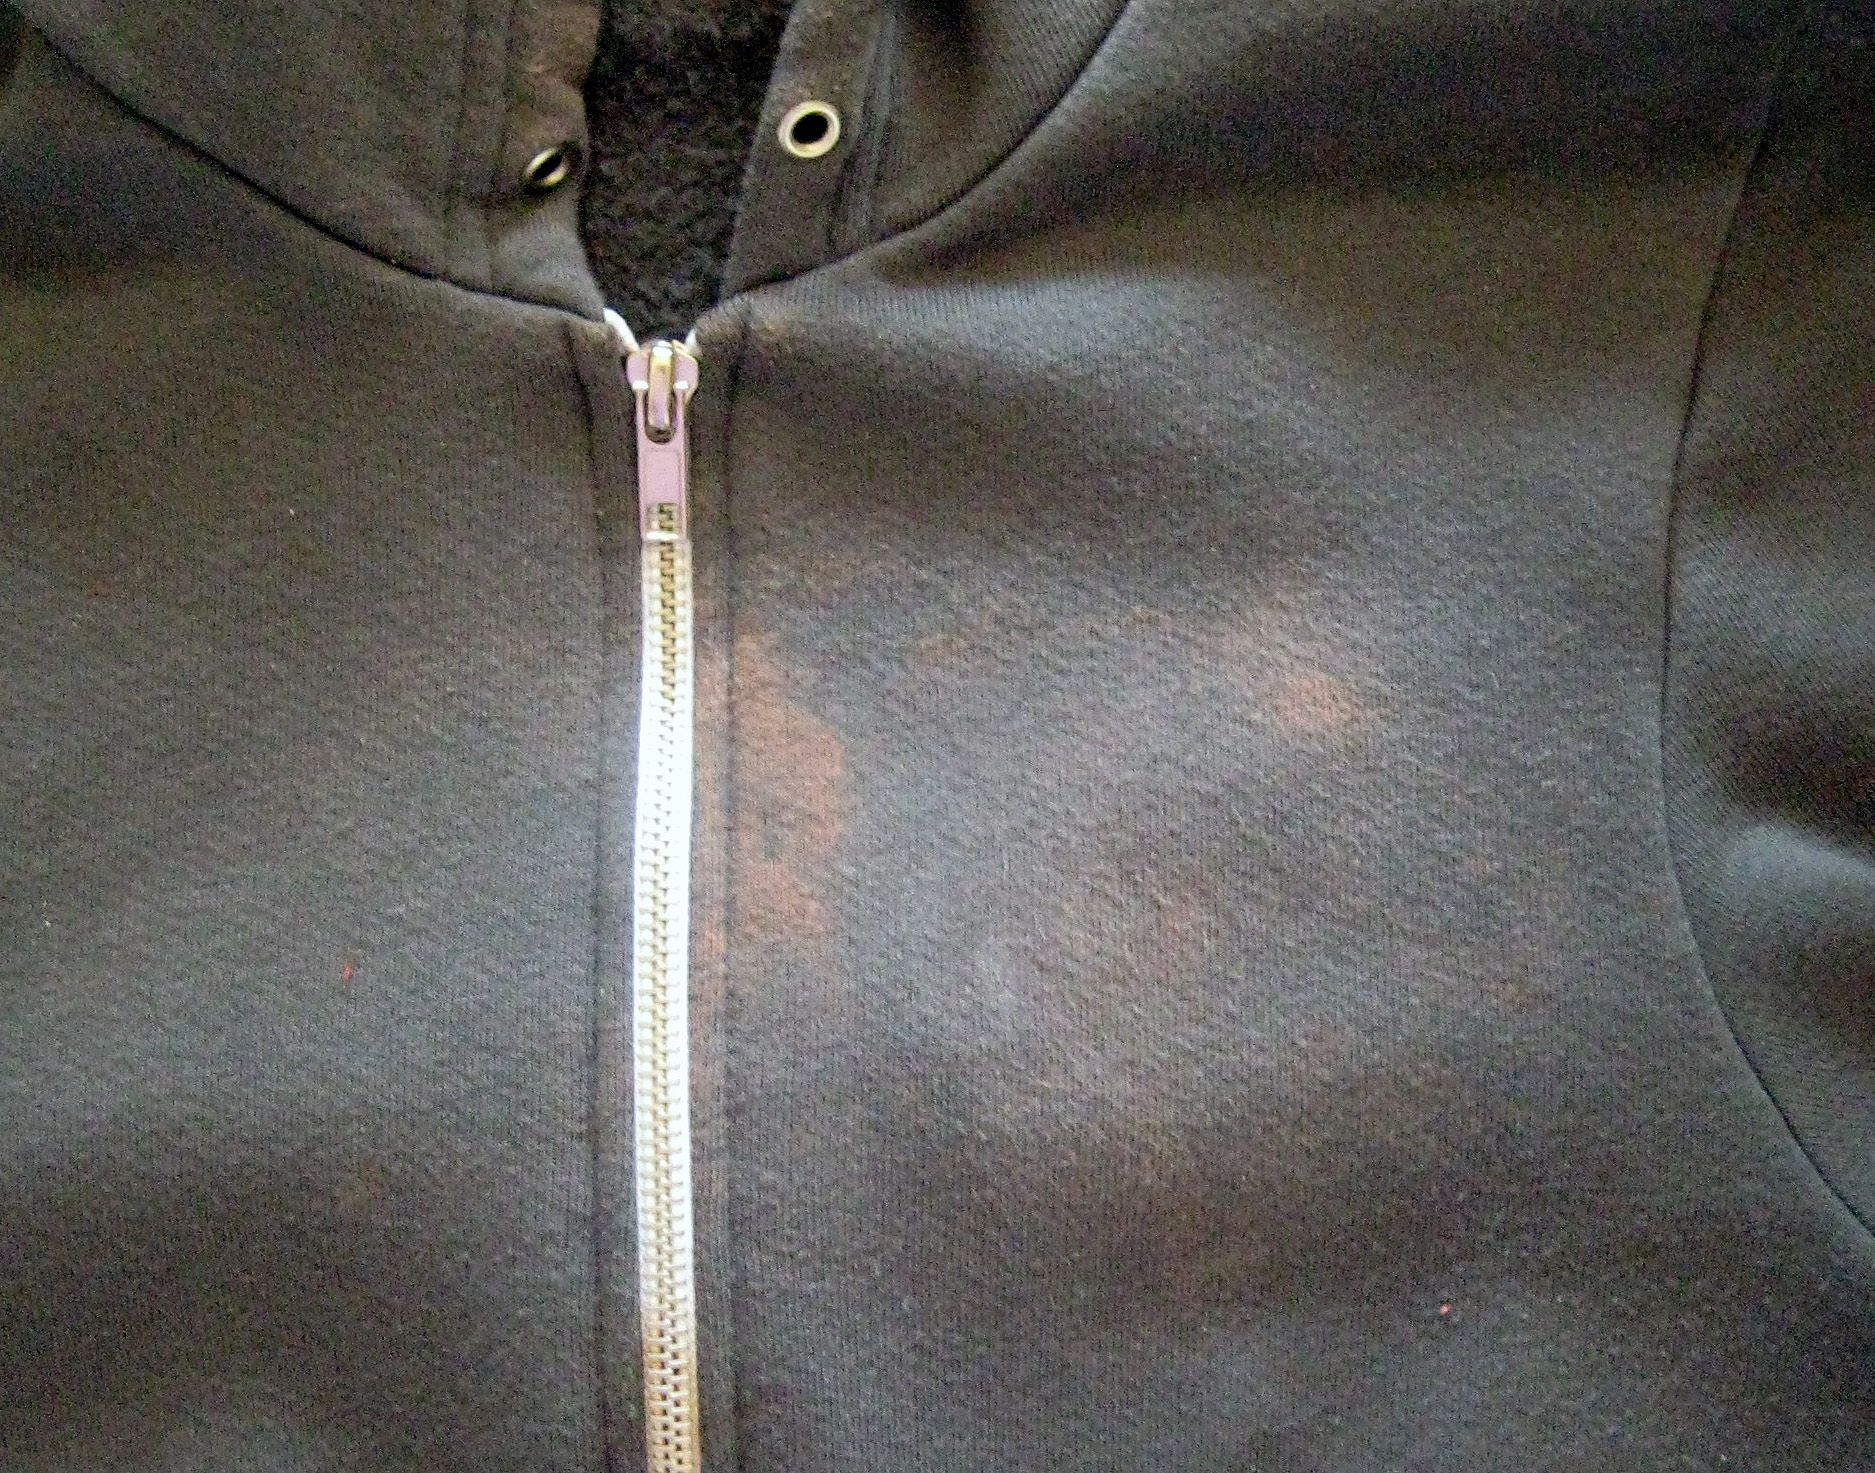 stains on hoodie